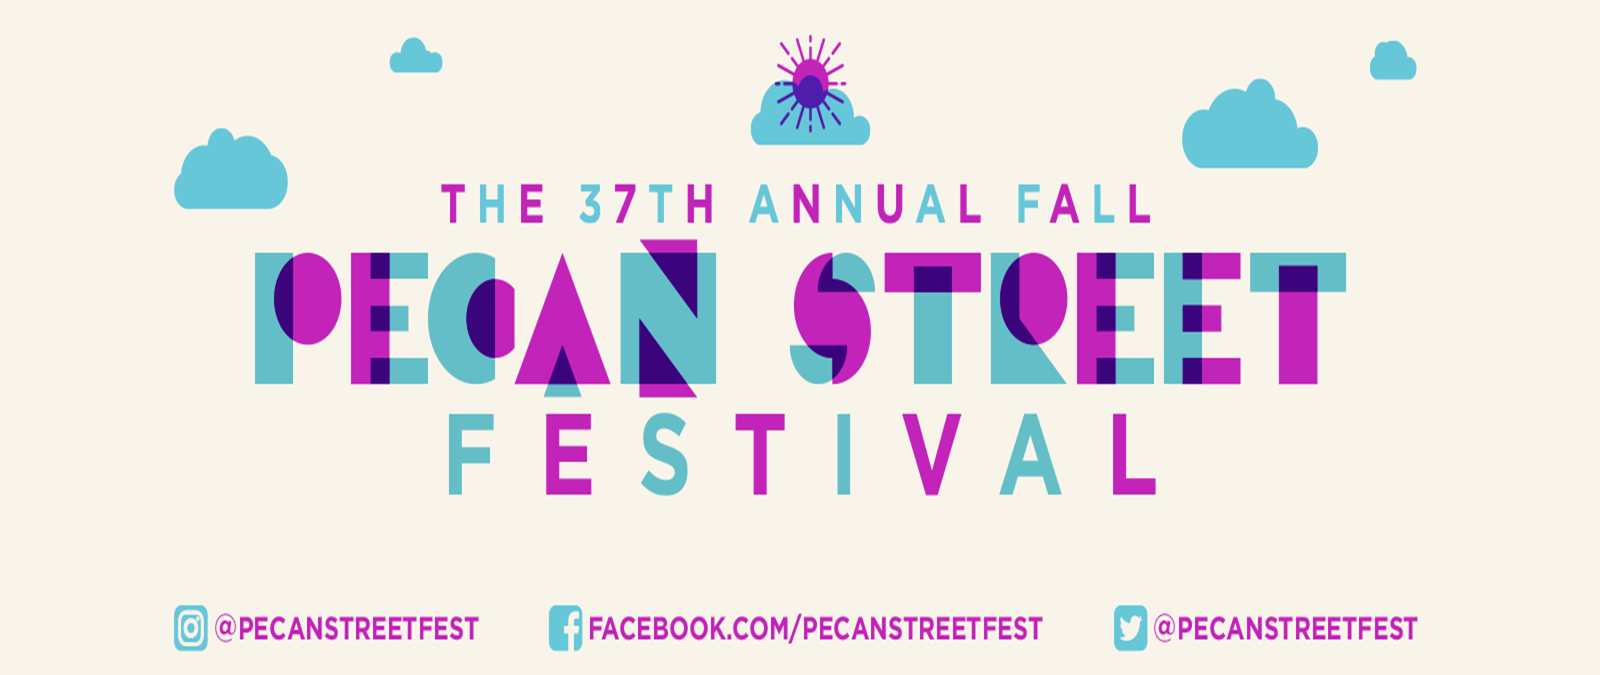 texas-discount-realty-austin-texas-pecan-street-festival-austin-texas-v1.png